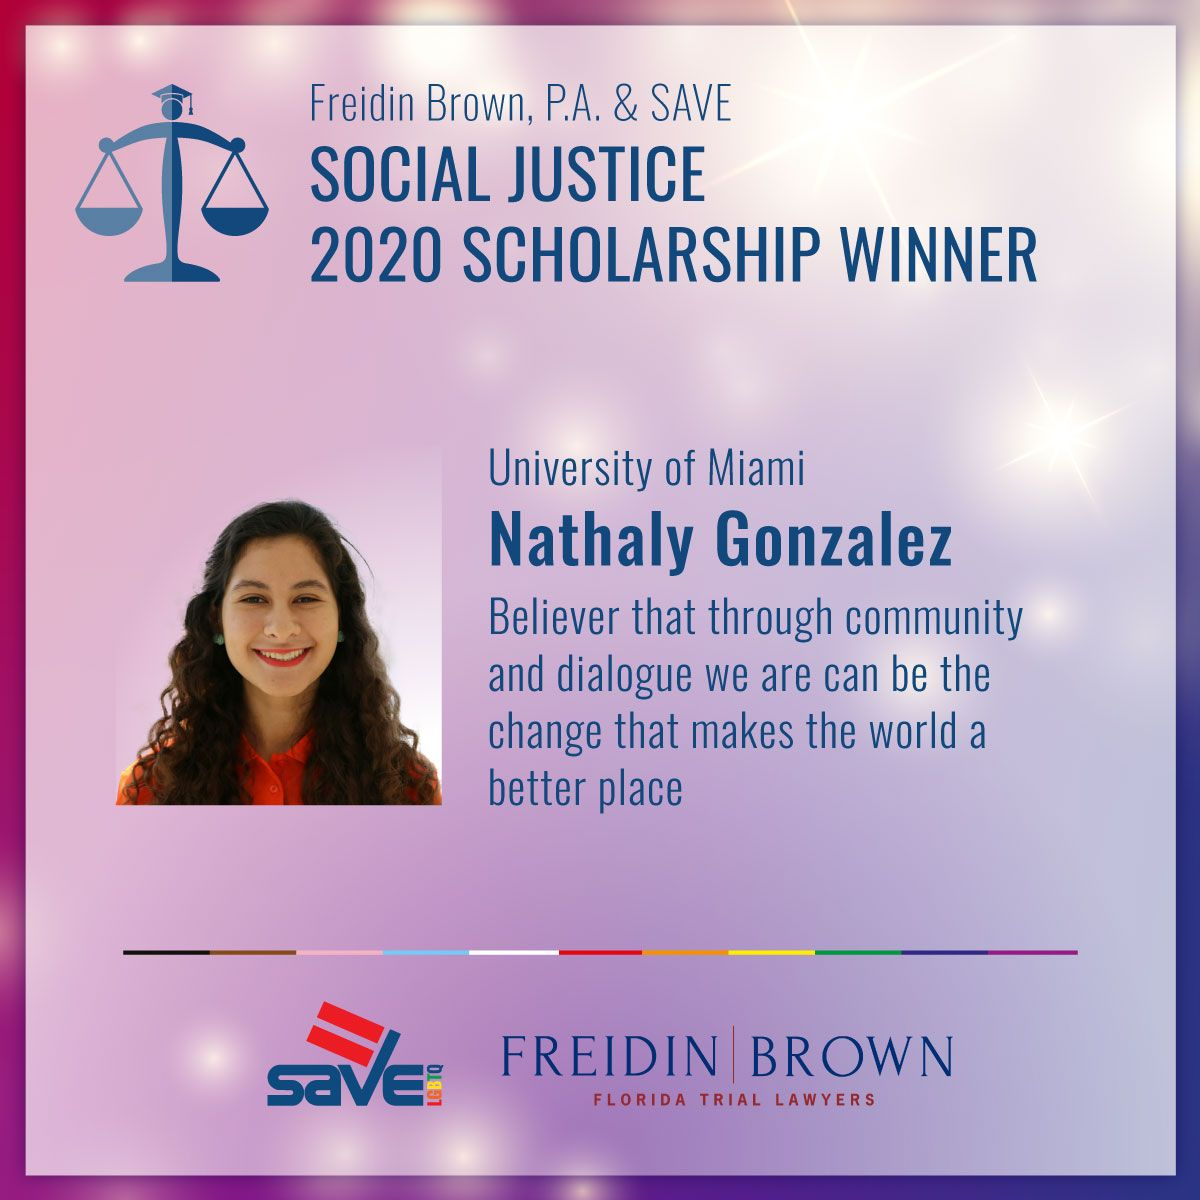 Nathaly Gonzalez